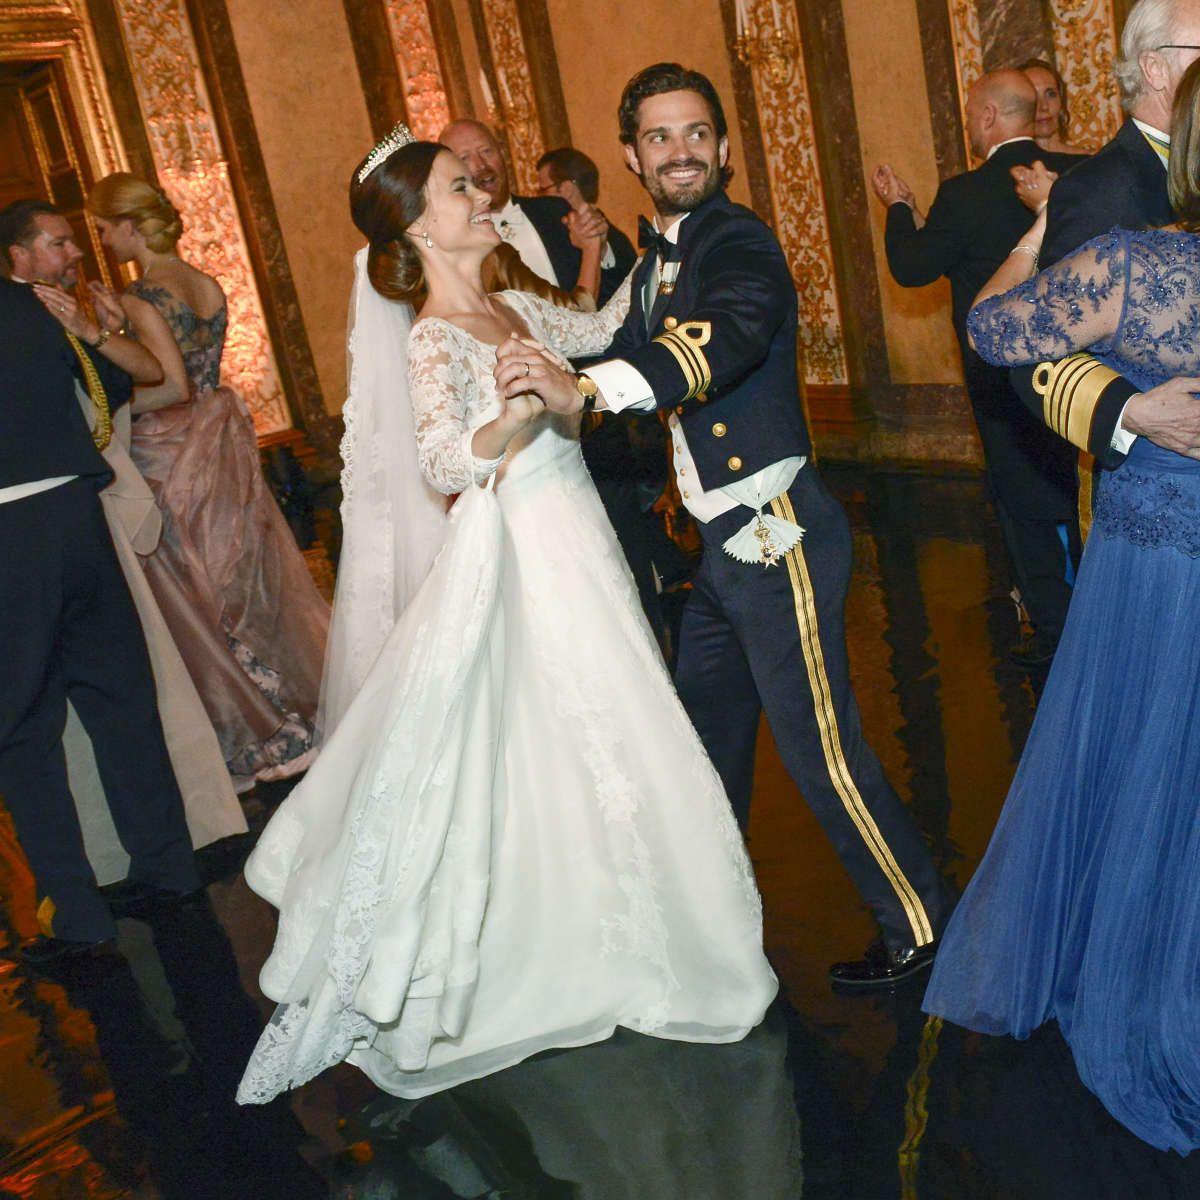 Stockholm 2015 06 13 Wedding Dance Royal Wedding Gowns Princess Sofia Of Sweden Princess Victoria Of Sweden [ 1200 x 1200 Pixel ]